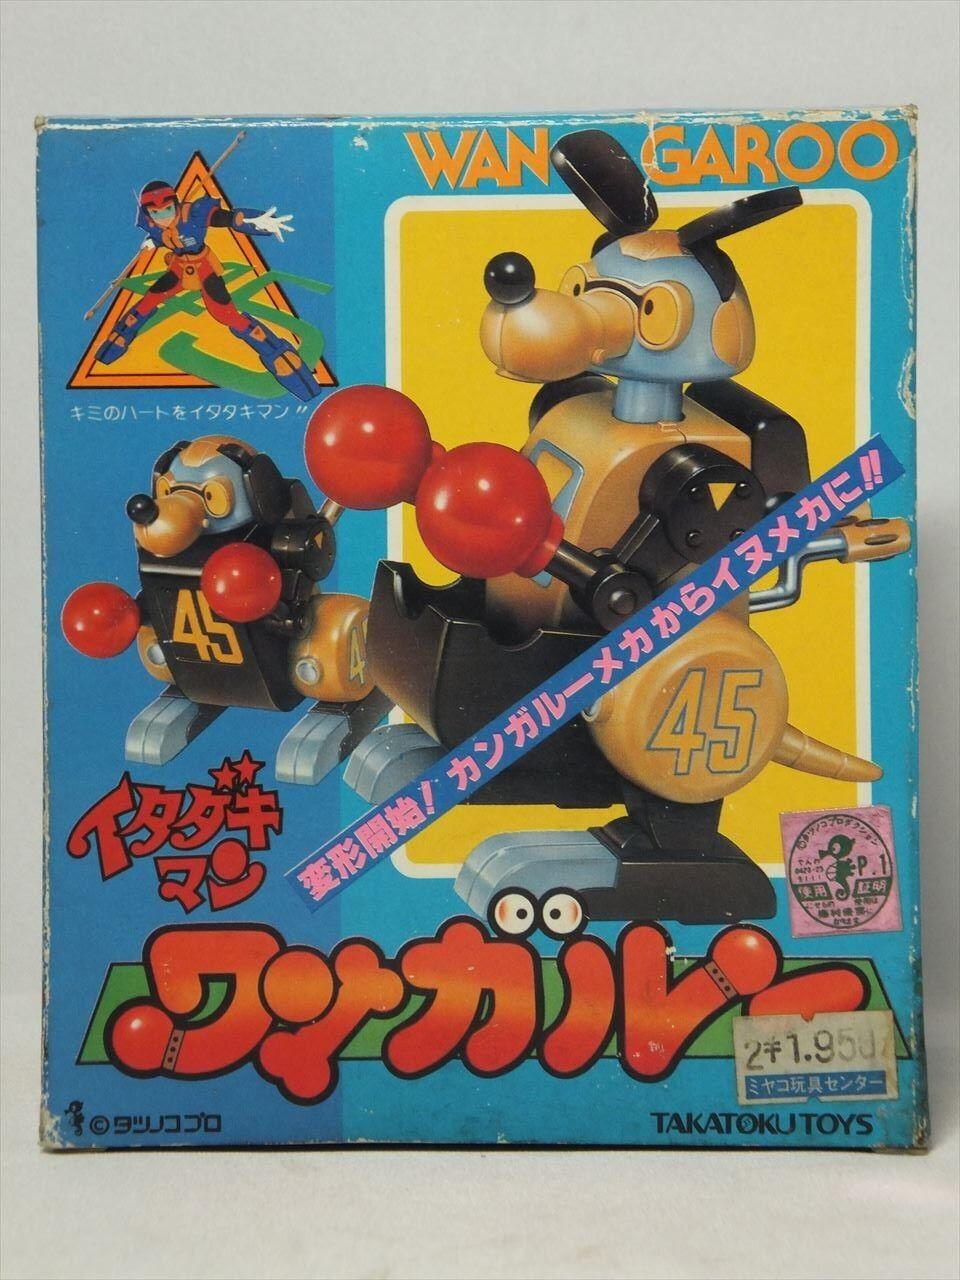 Vintage '80s ITADAKIMAN WANGAROO Takatoku Toys Japan Super Rare yatterman